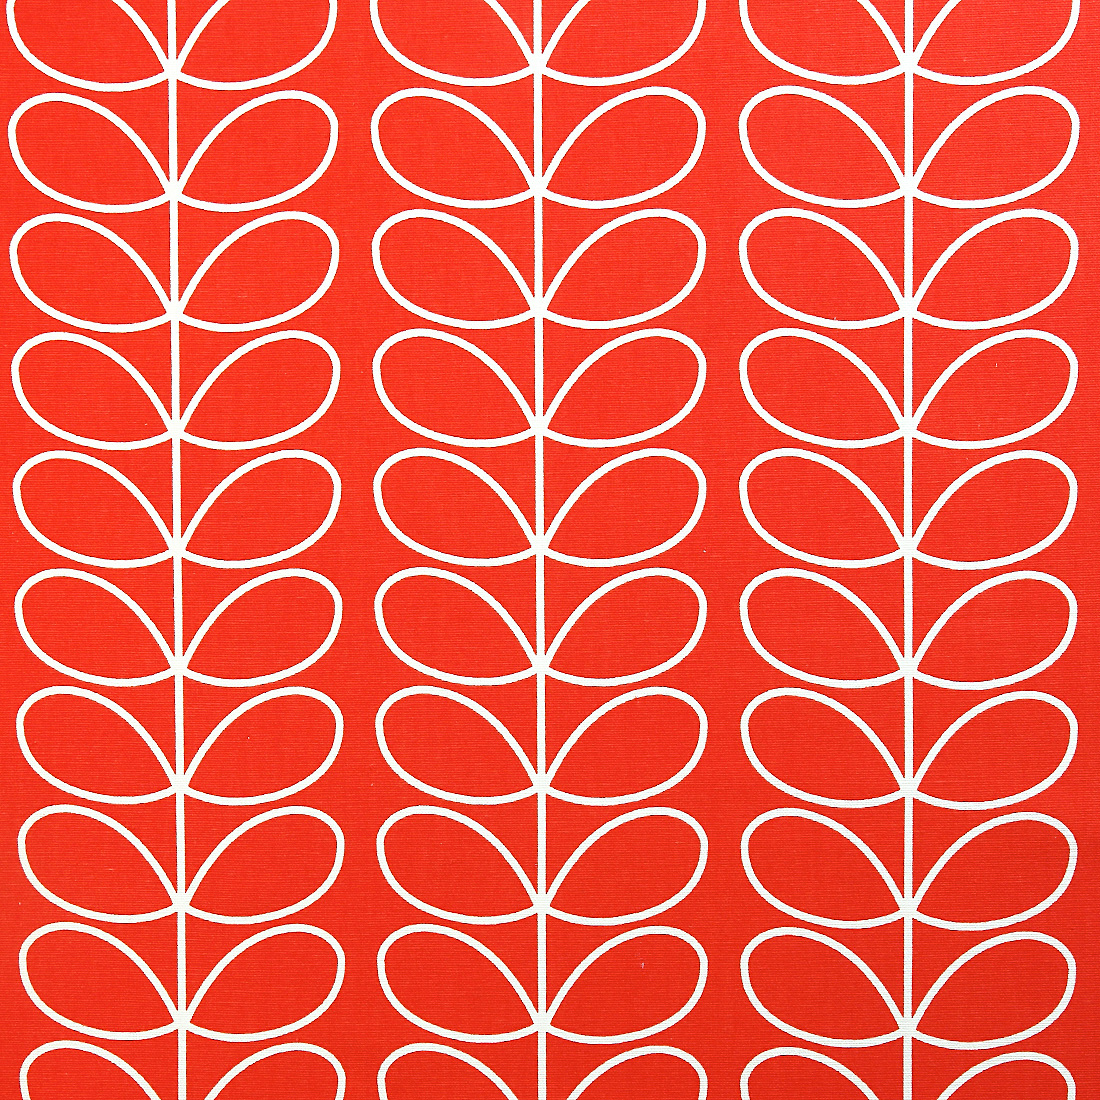 Orla Kiely Linear Stem Tomato Curtain Fabric